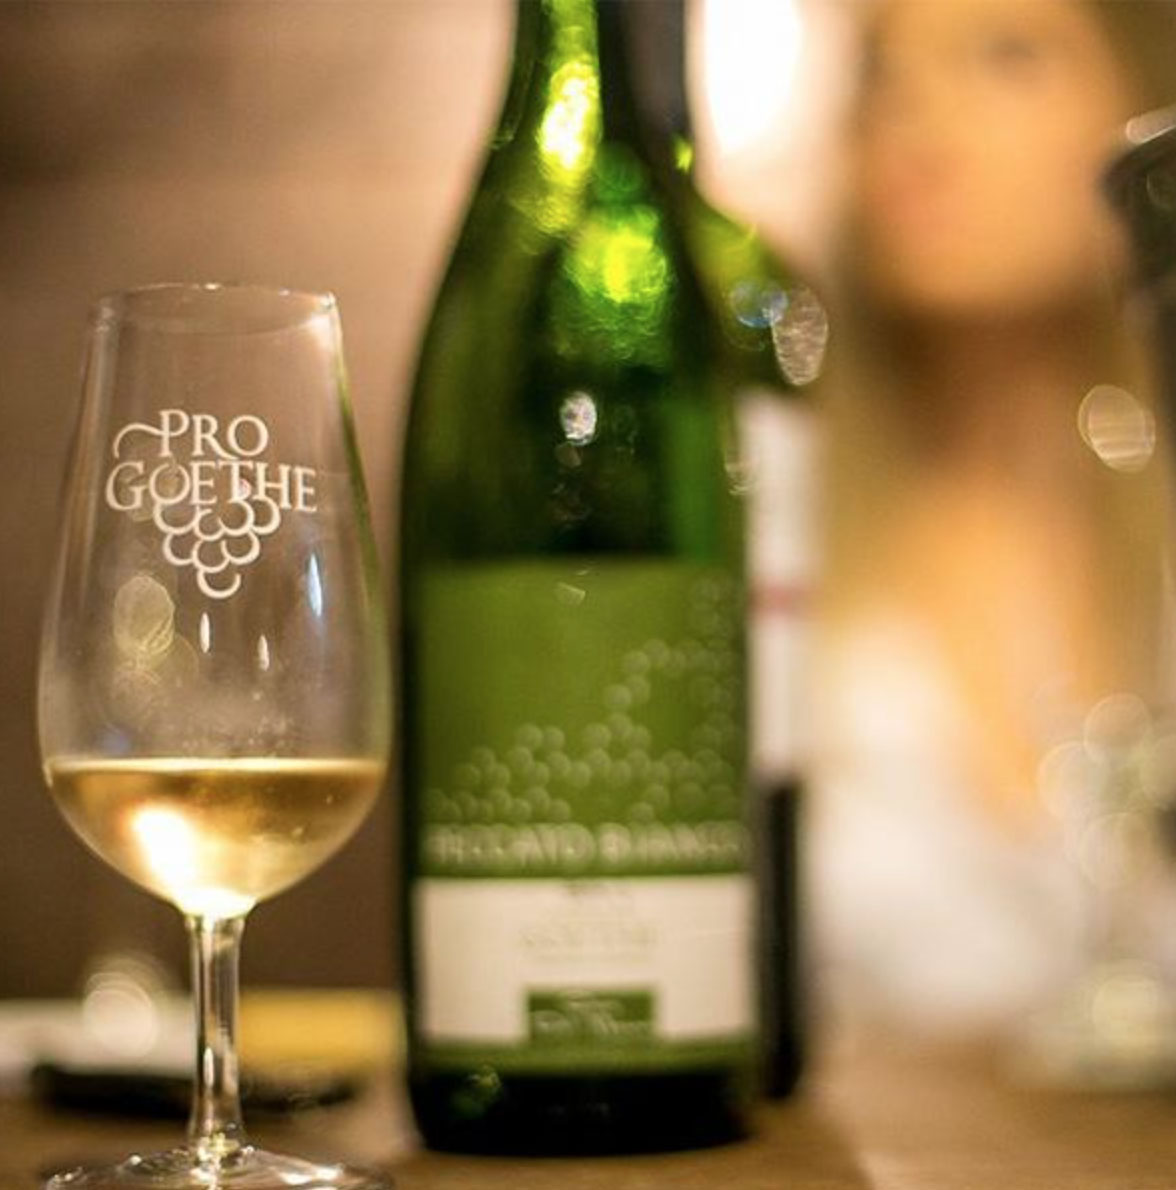 Vinho Branco Peccato Bianco Legno - Uva Goethe - 3 meses de barrica de carvalho - Casa Del Nonno